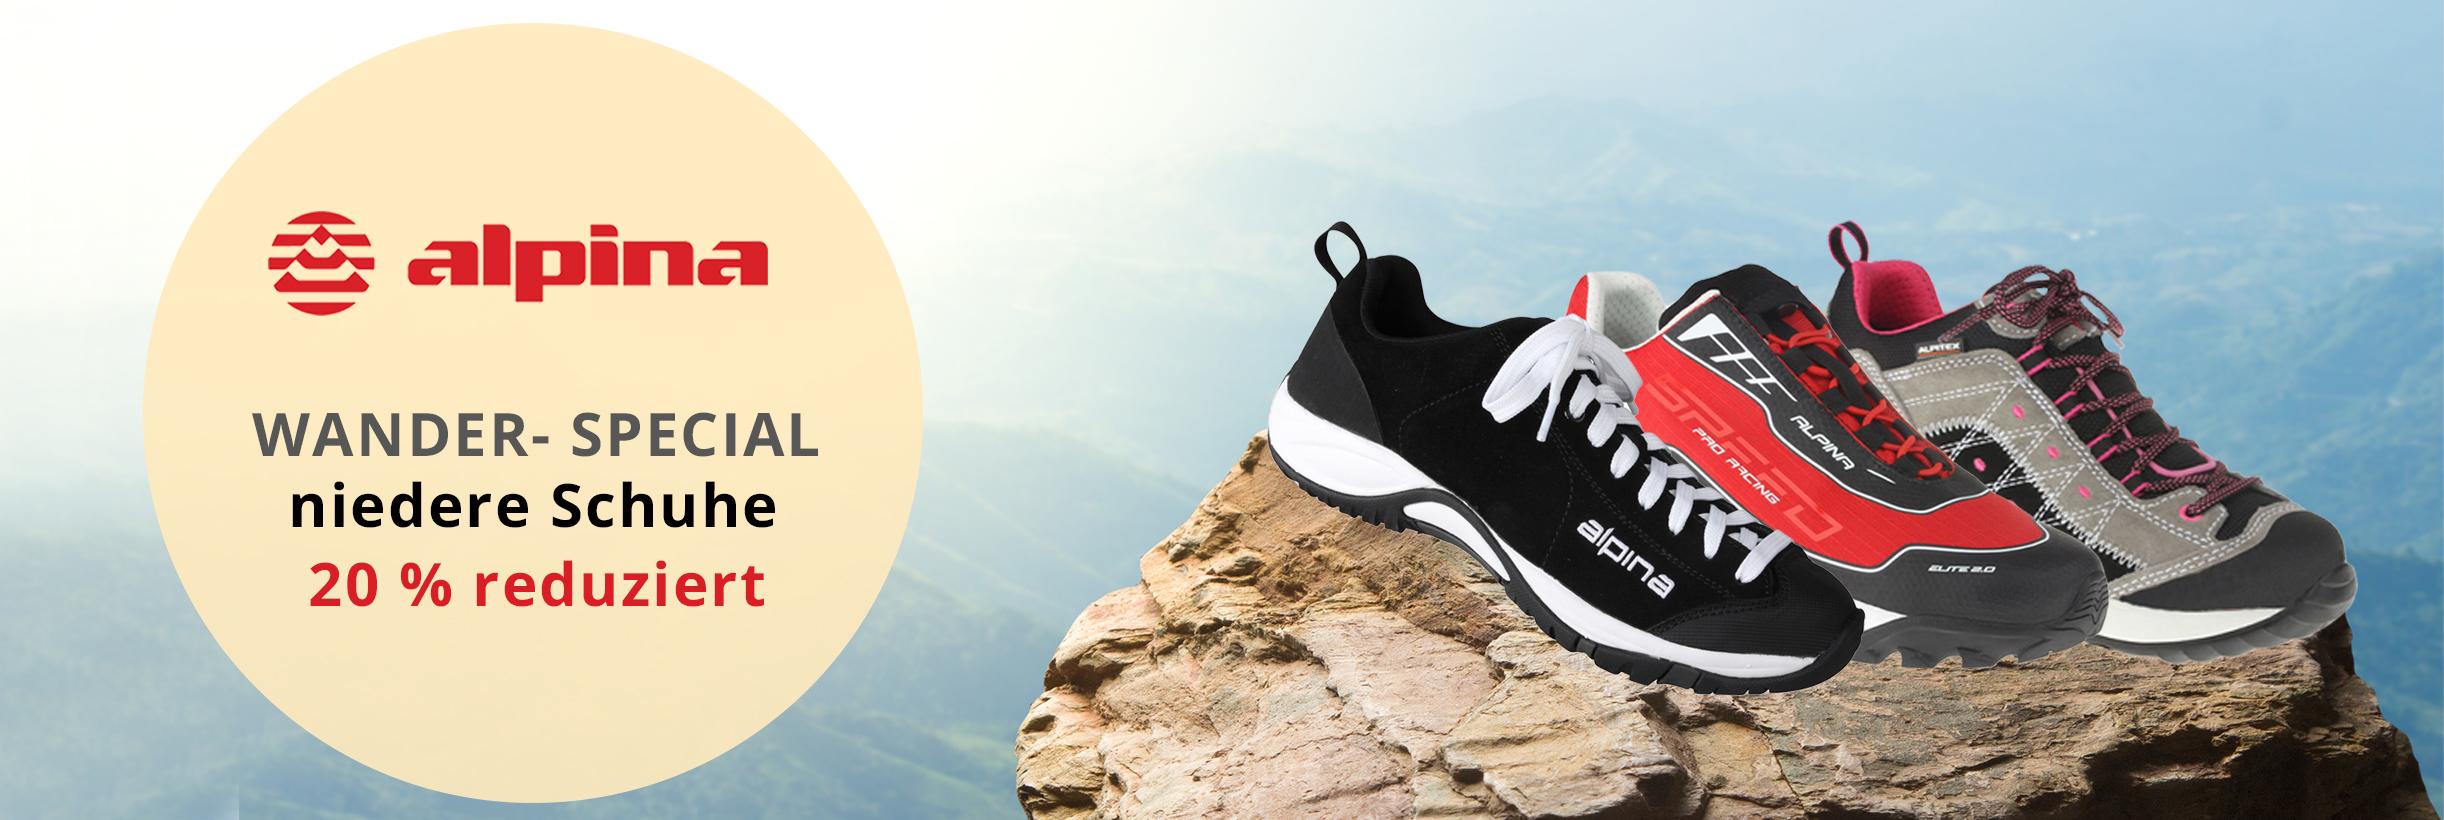 Kategoriebild Wanderwoche - niedere Schuhe